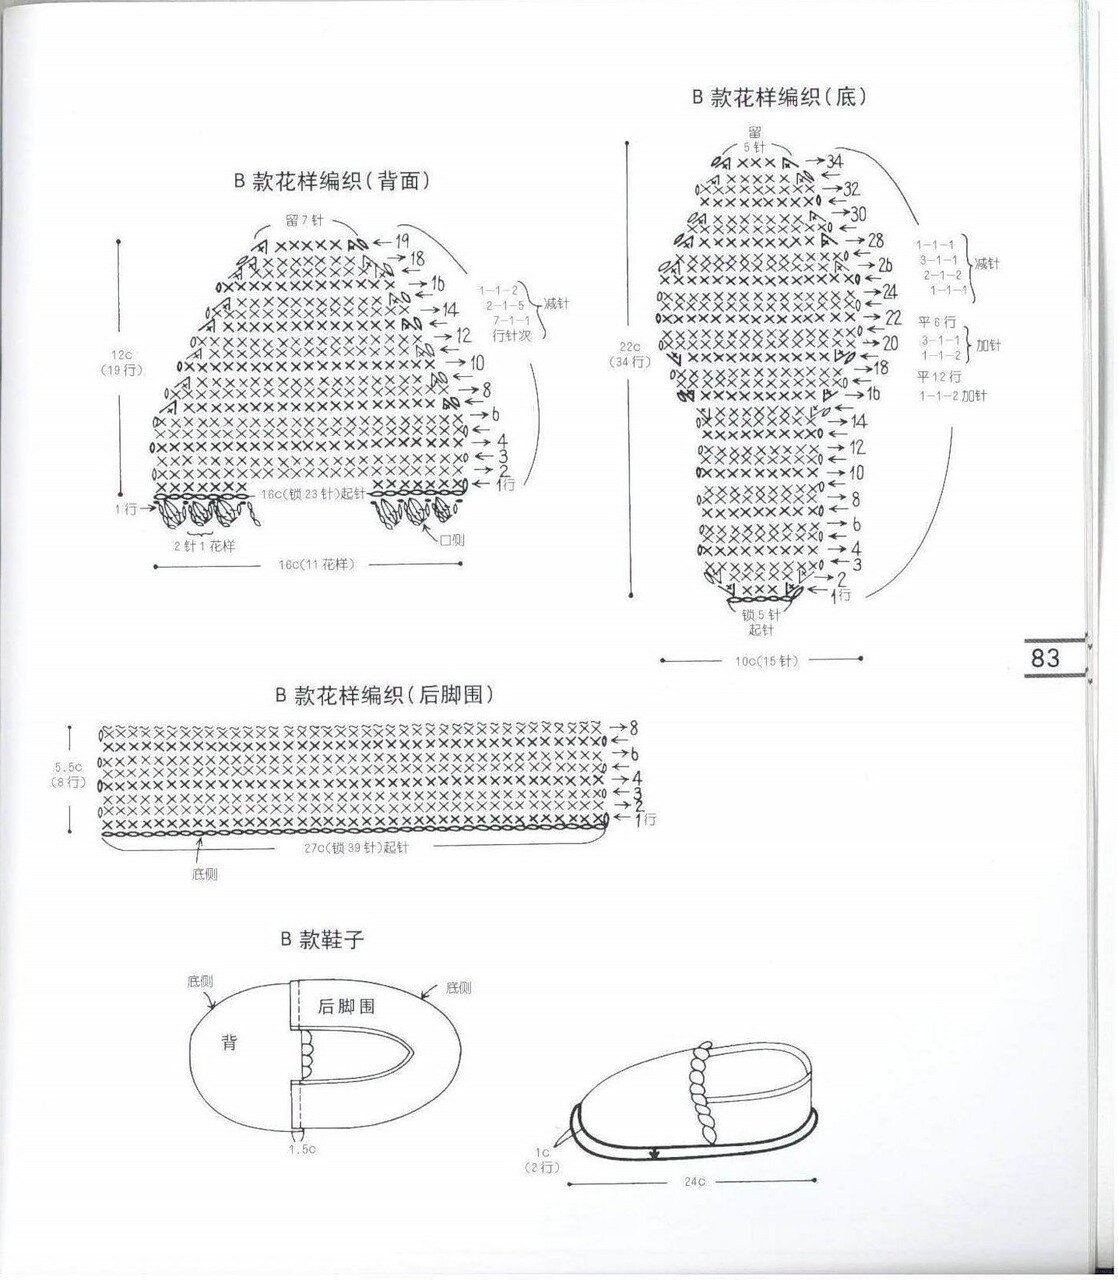 Тапочки вязать крючком подробная схема